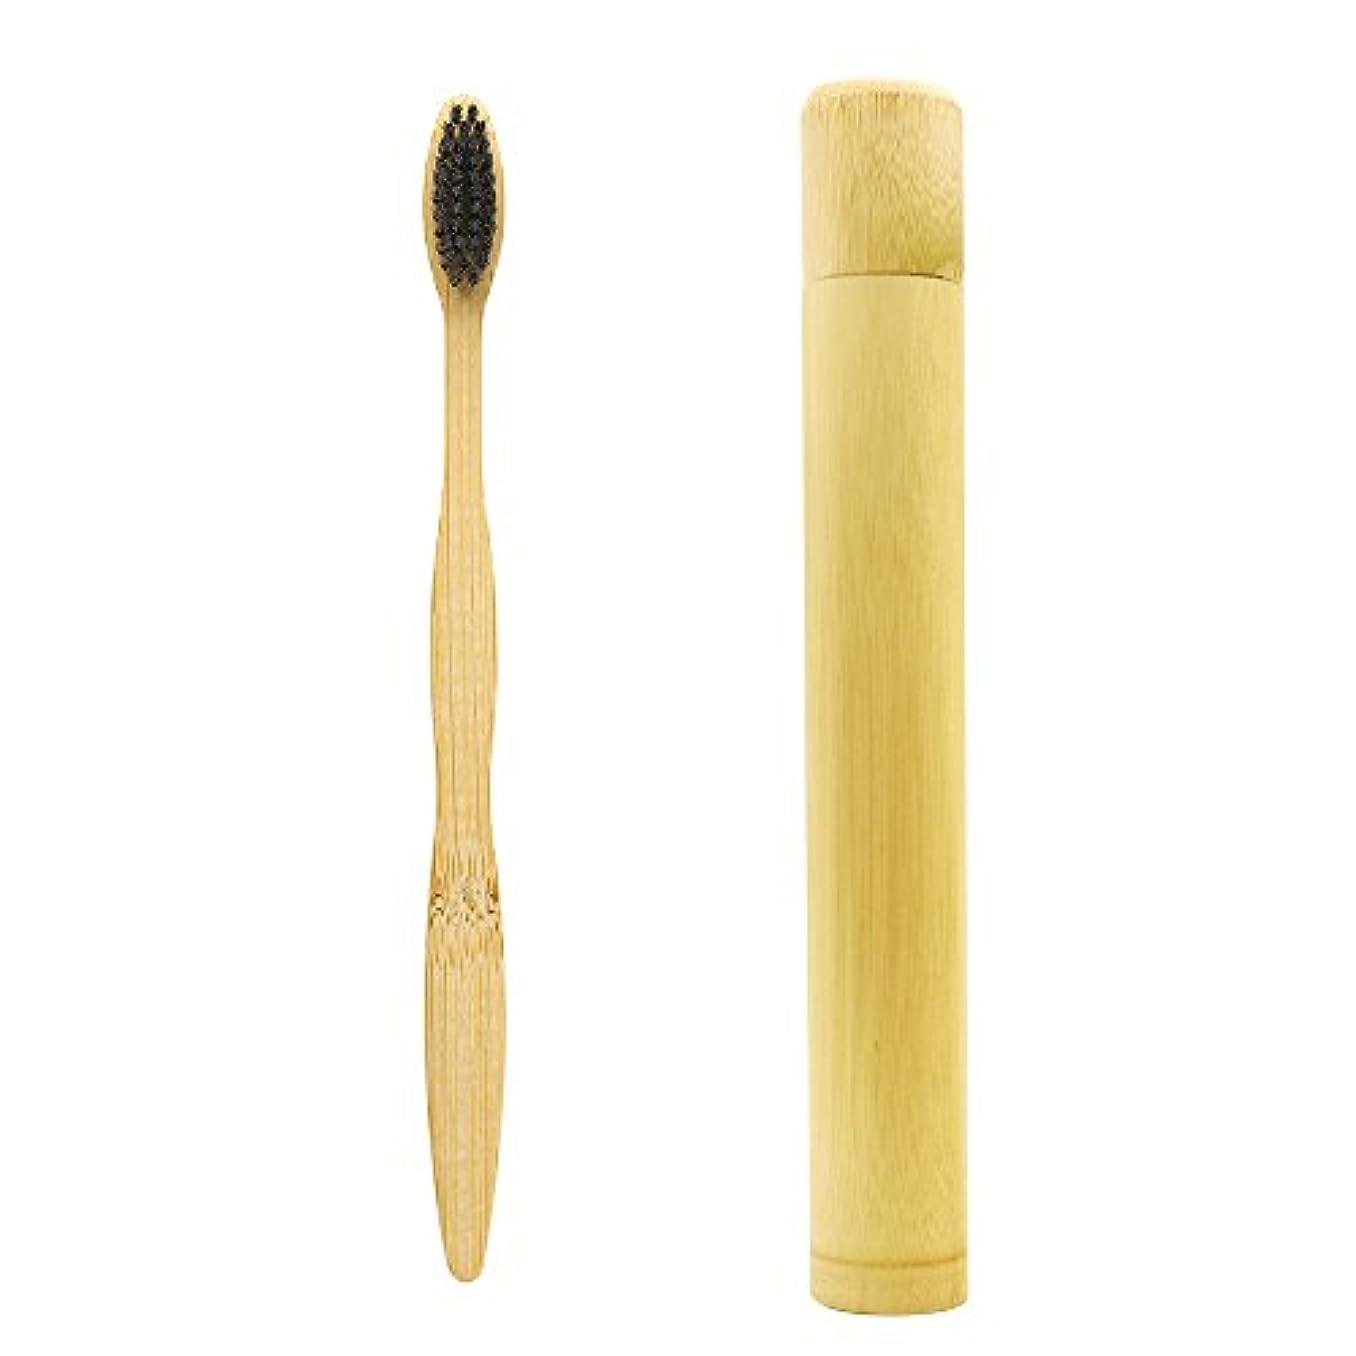 N-amboo 歯ブラシ ケース付き 竹製 高耐久性 出張旅行 携帯便利